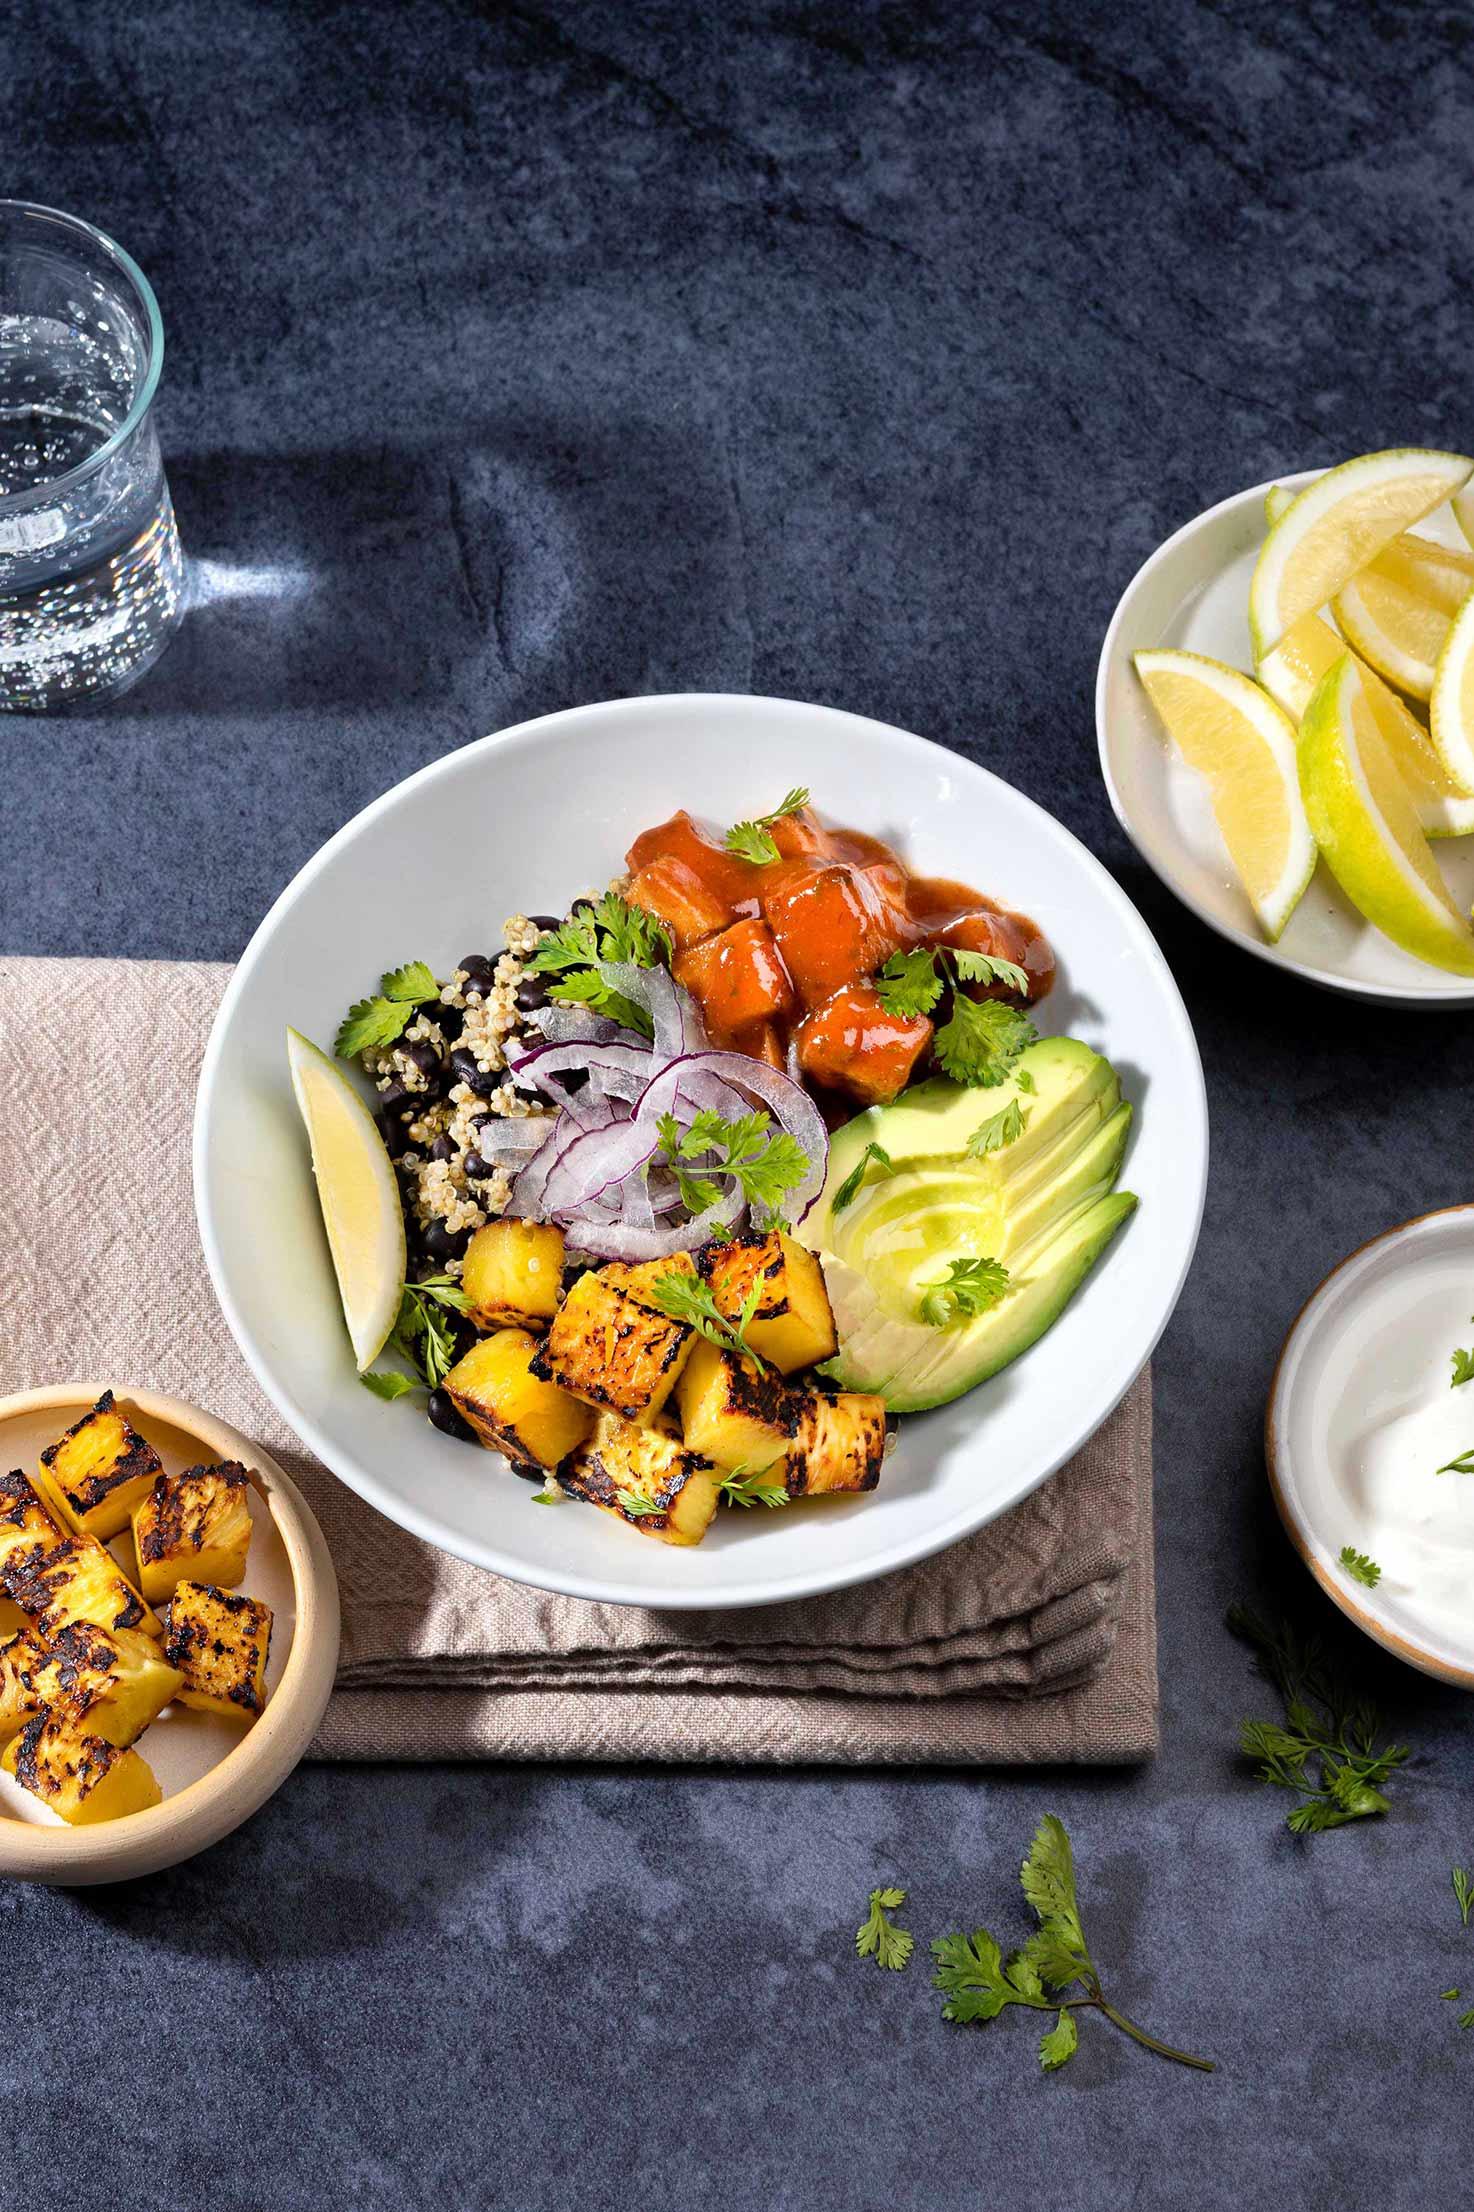 Black Bean Burrito Bowl is served with greek yogurt, lemon wedges, cilantro and fried tofu | Hurry The Food Up